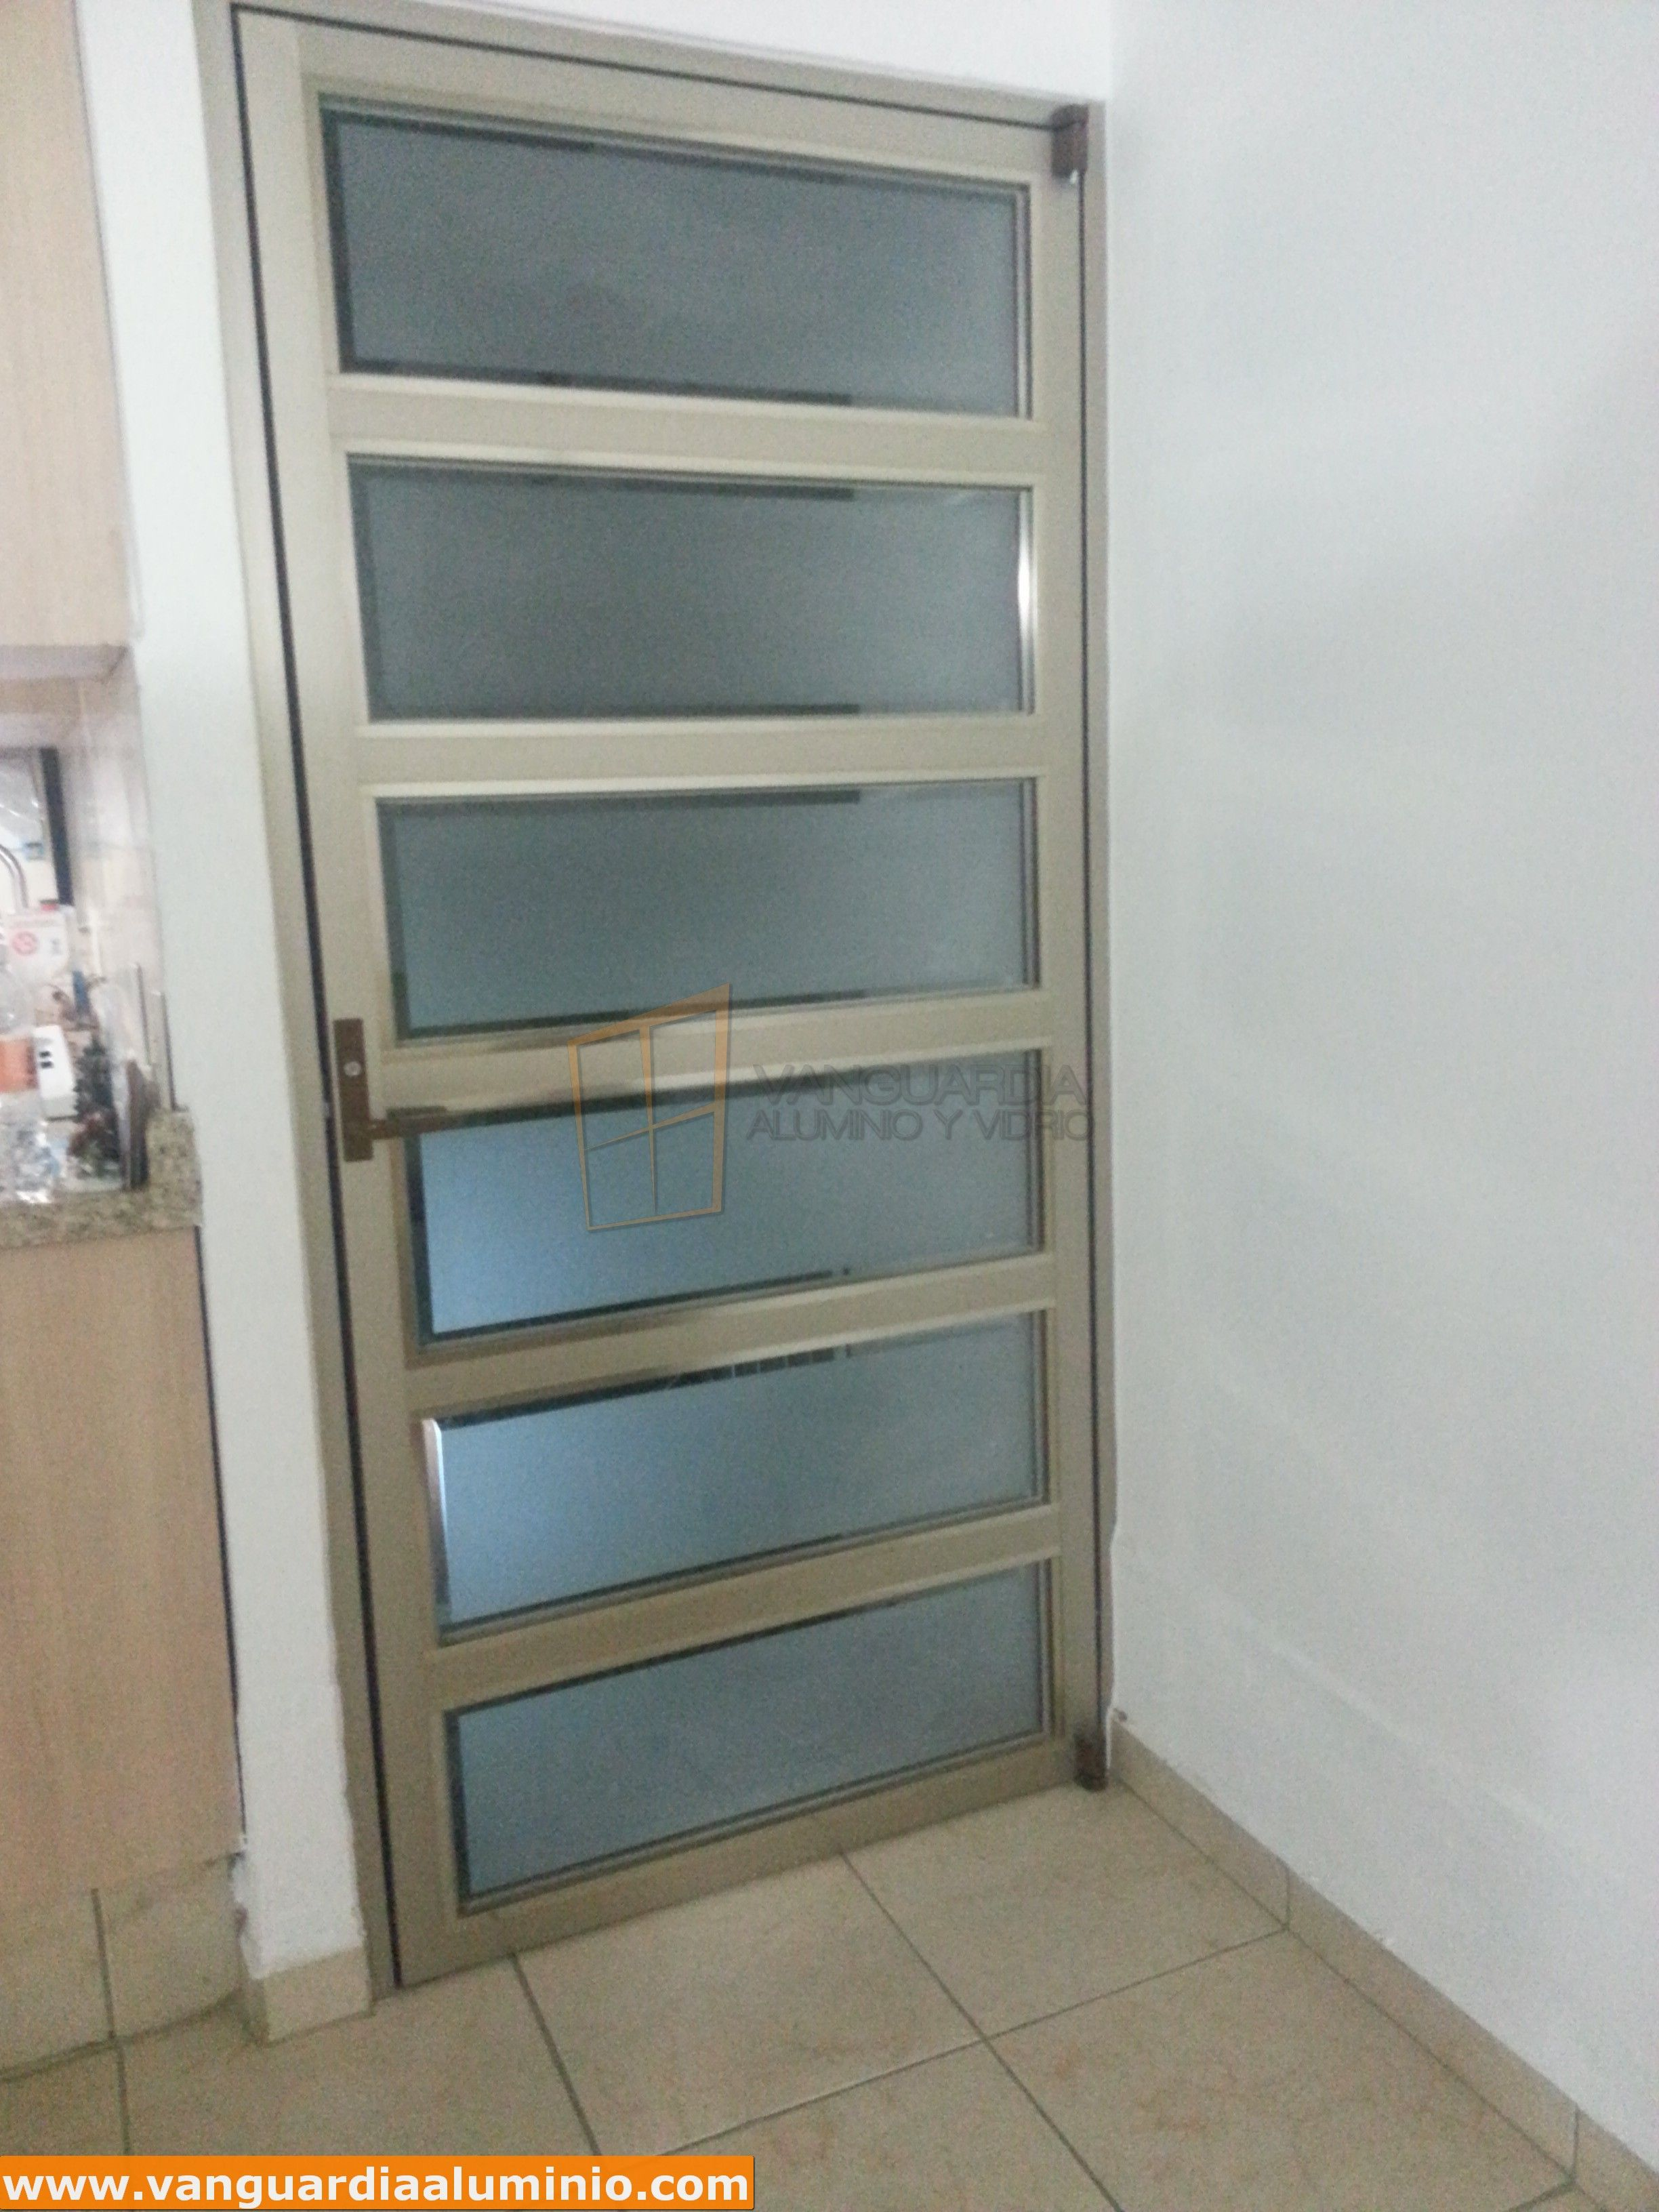 Puerta aluminio vidrio 2448 3264 puertas de for Manijas para puertas de vidrio